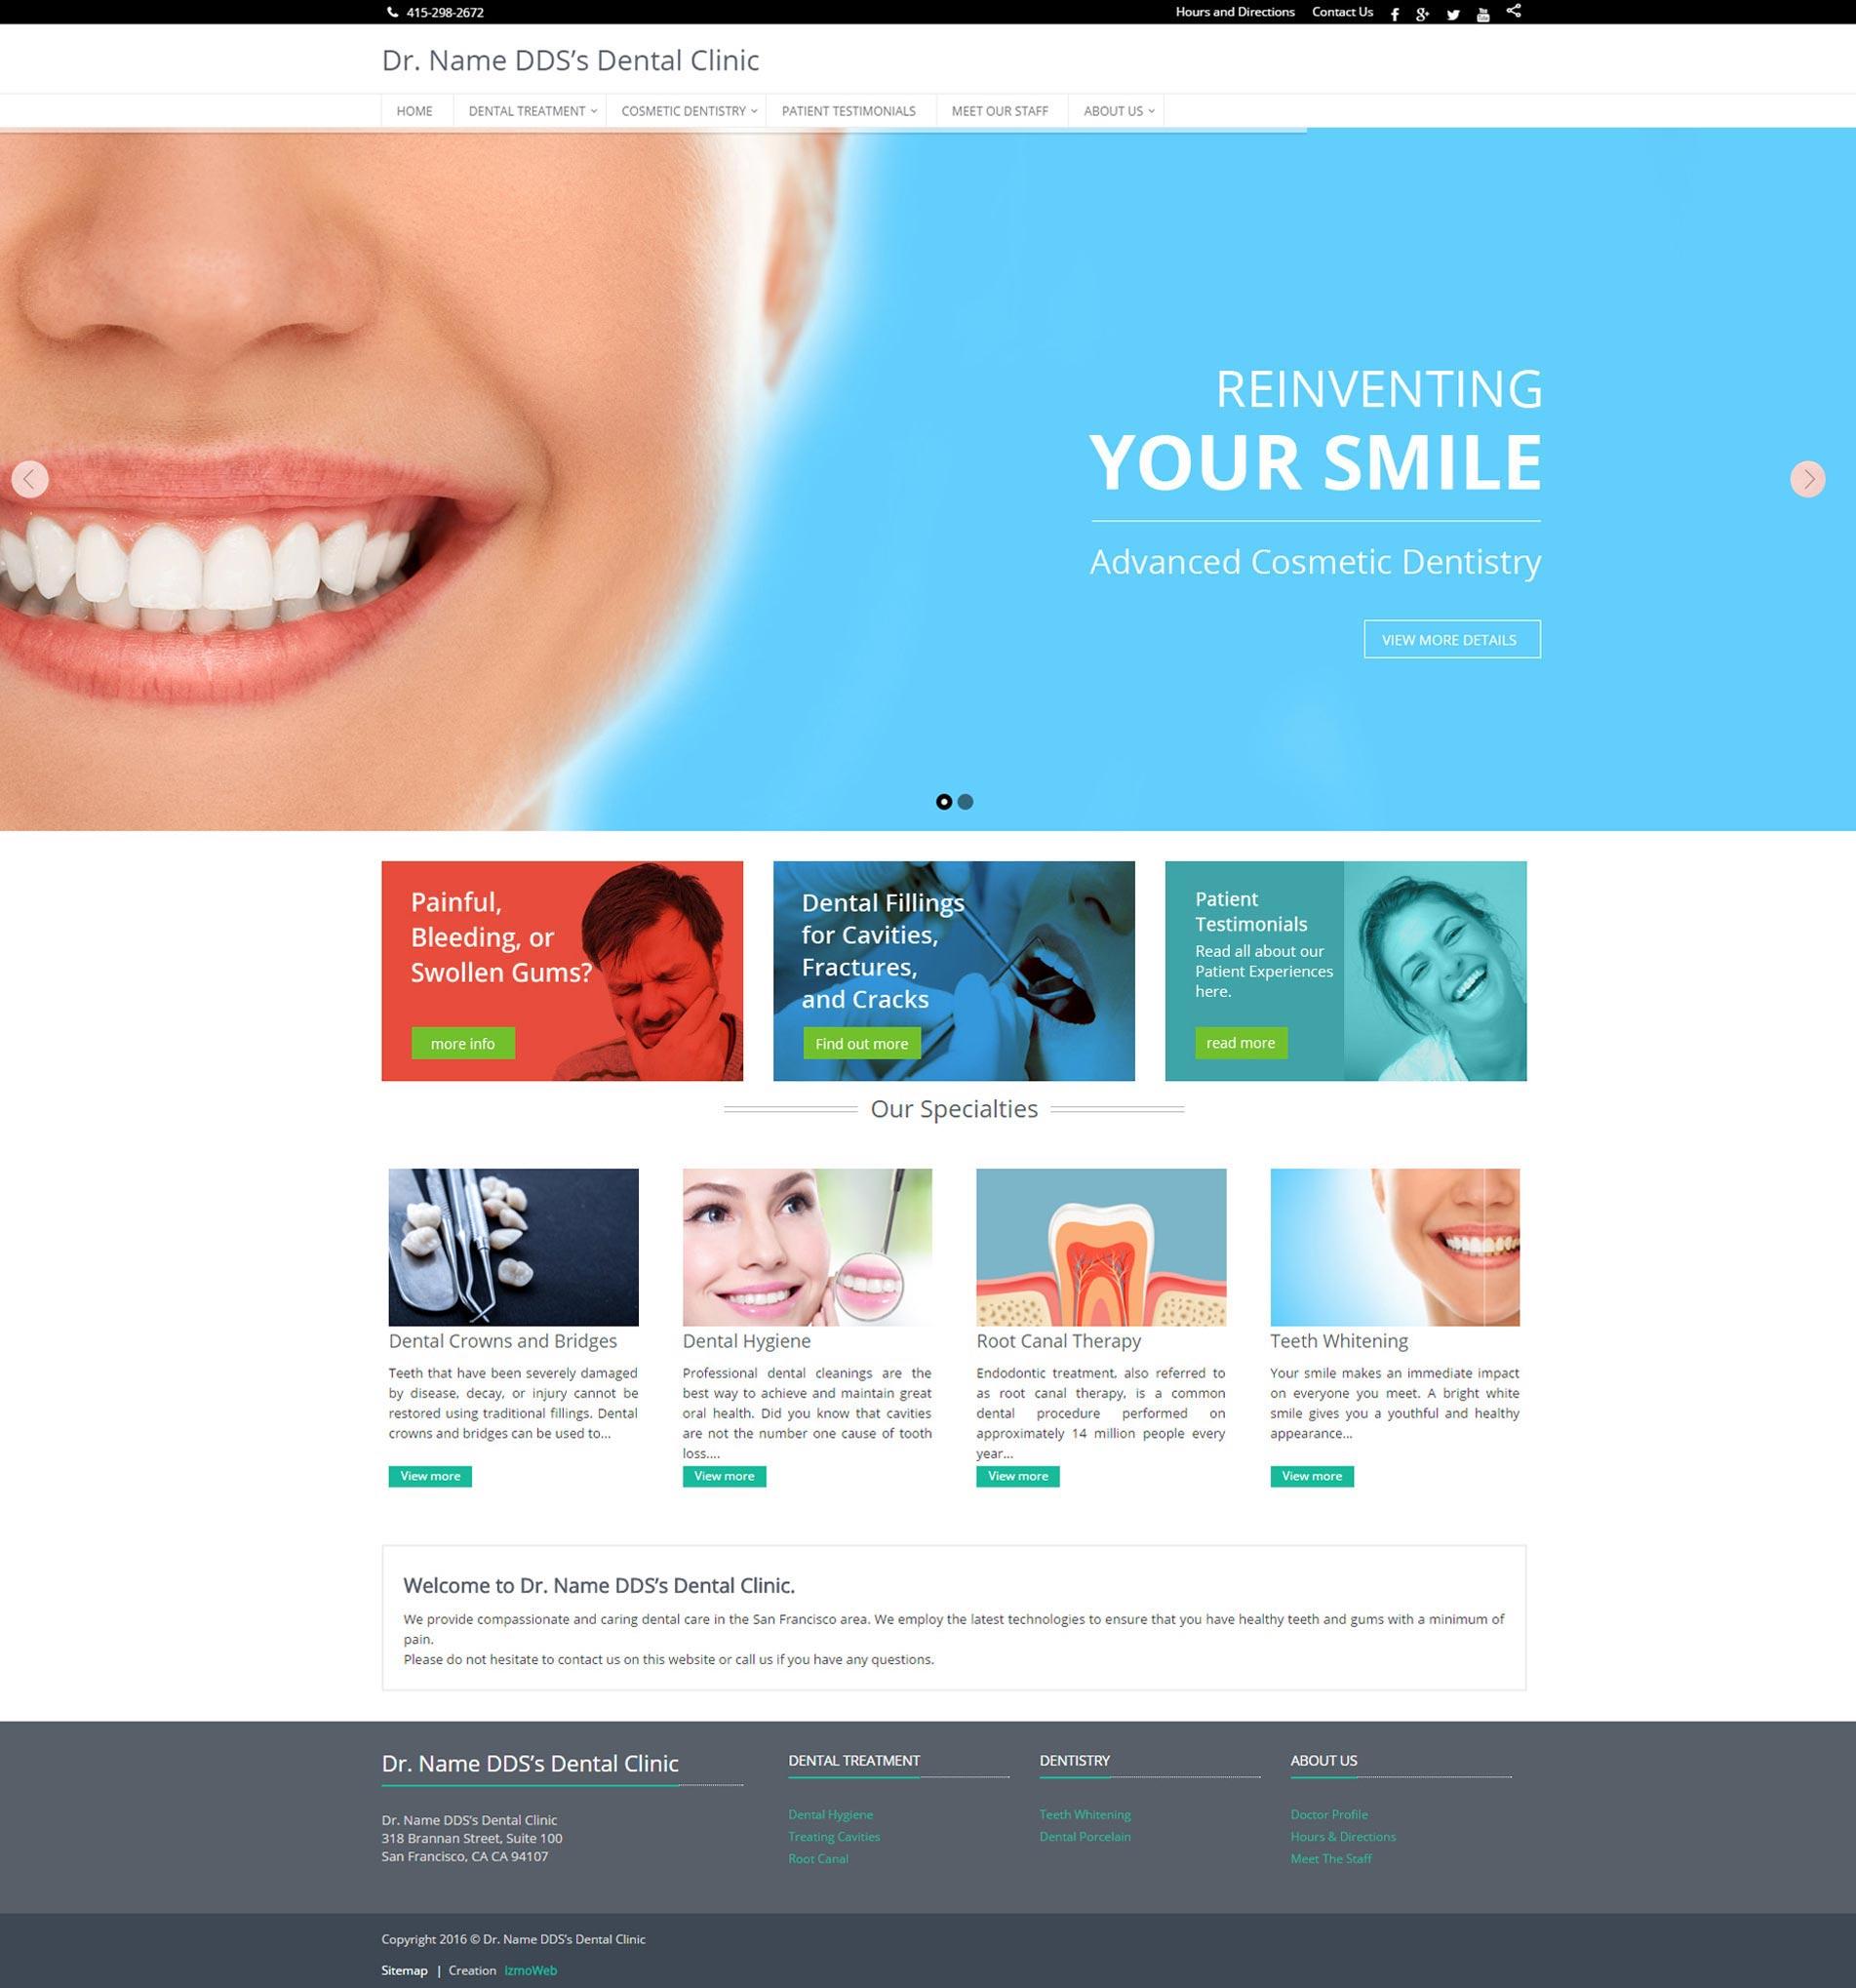 Dentistry Websites - Demo | izmoMD, San Francisco